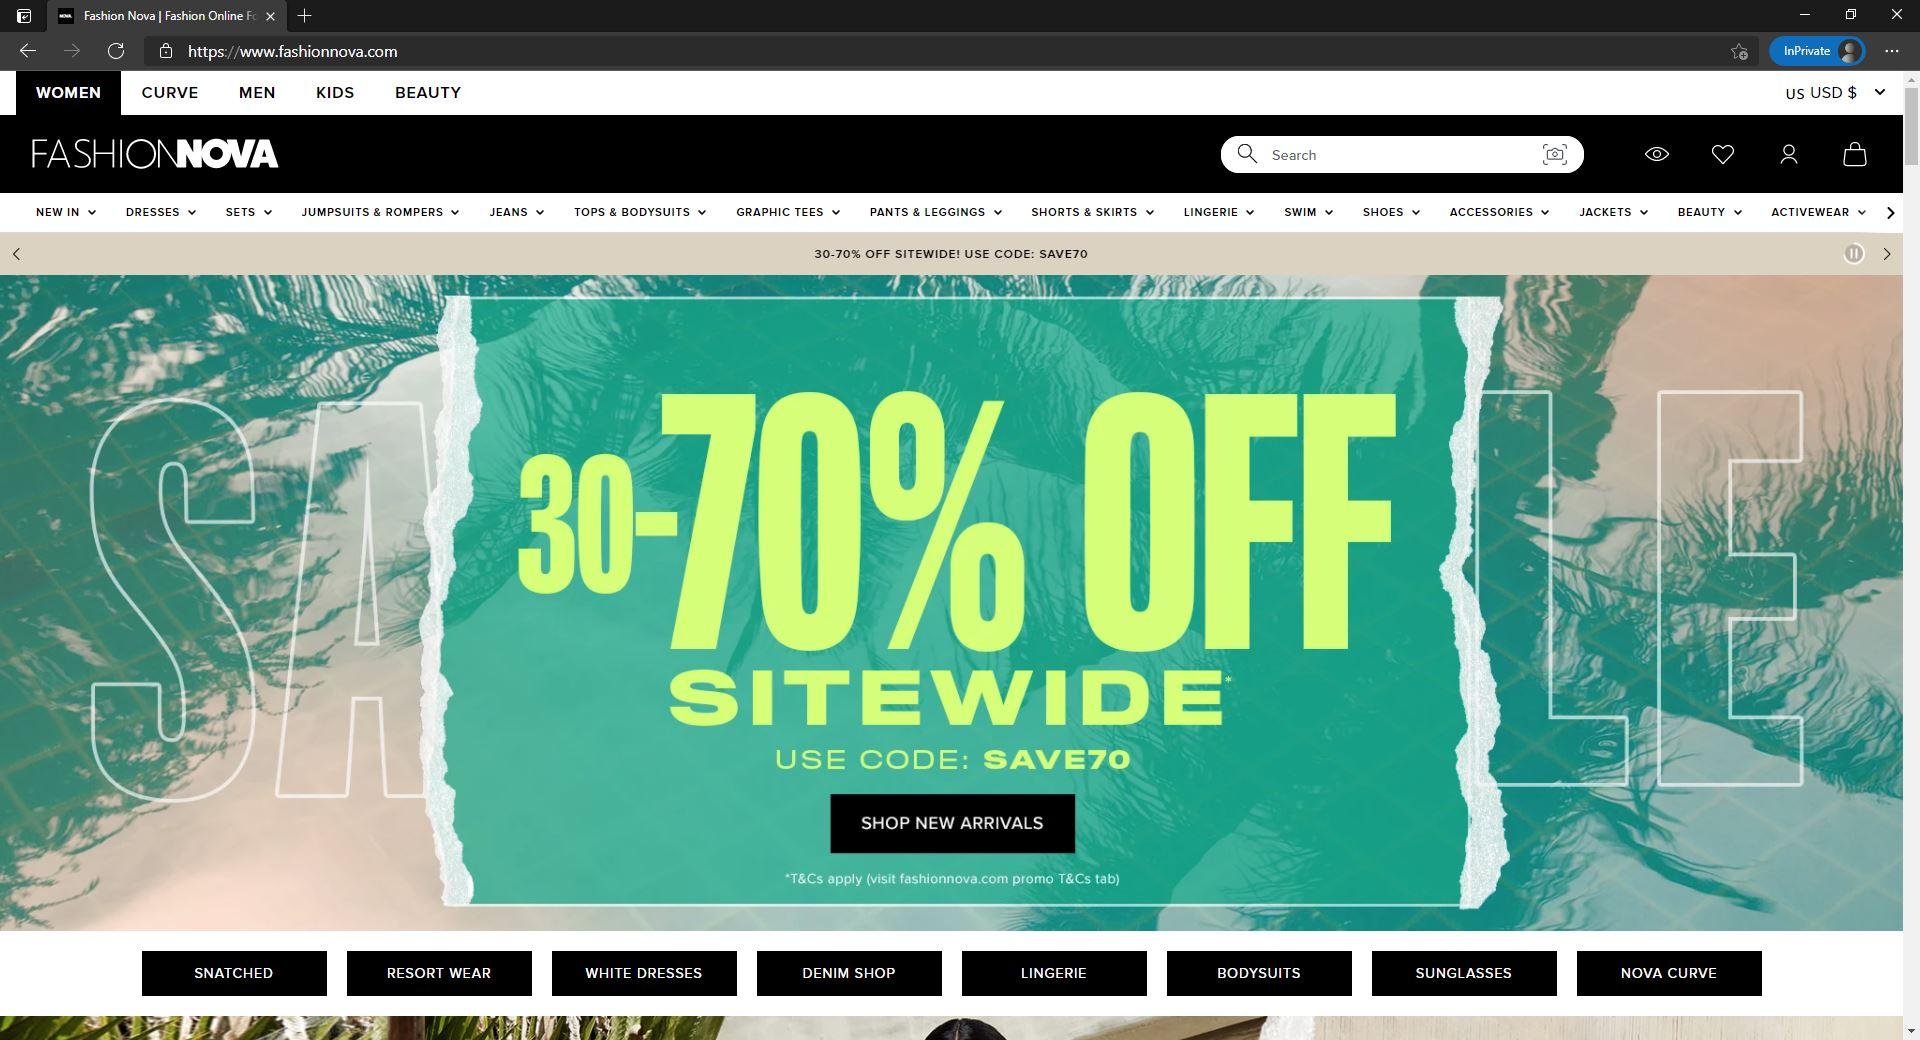 Fashion Nova website homepage